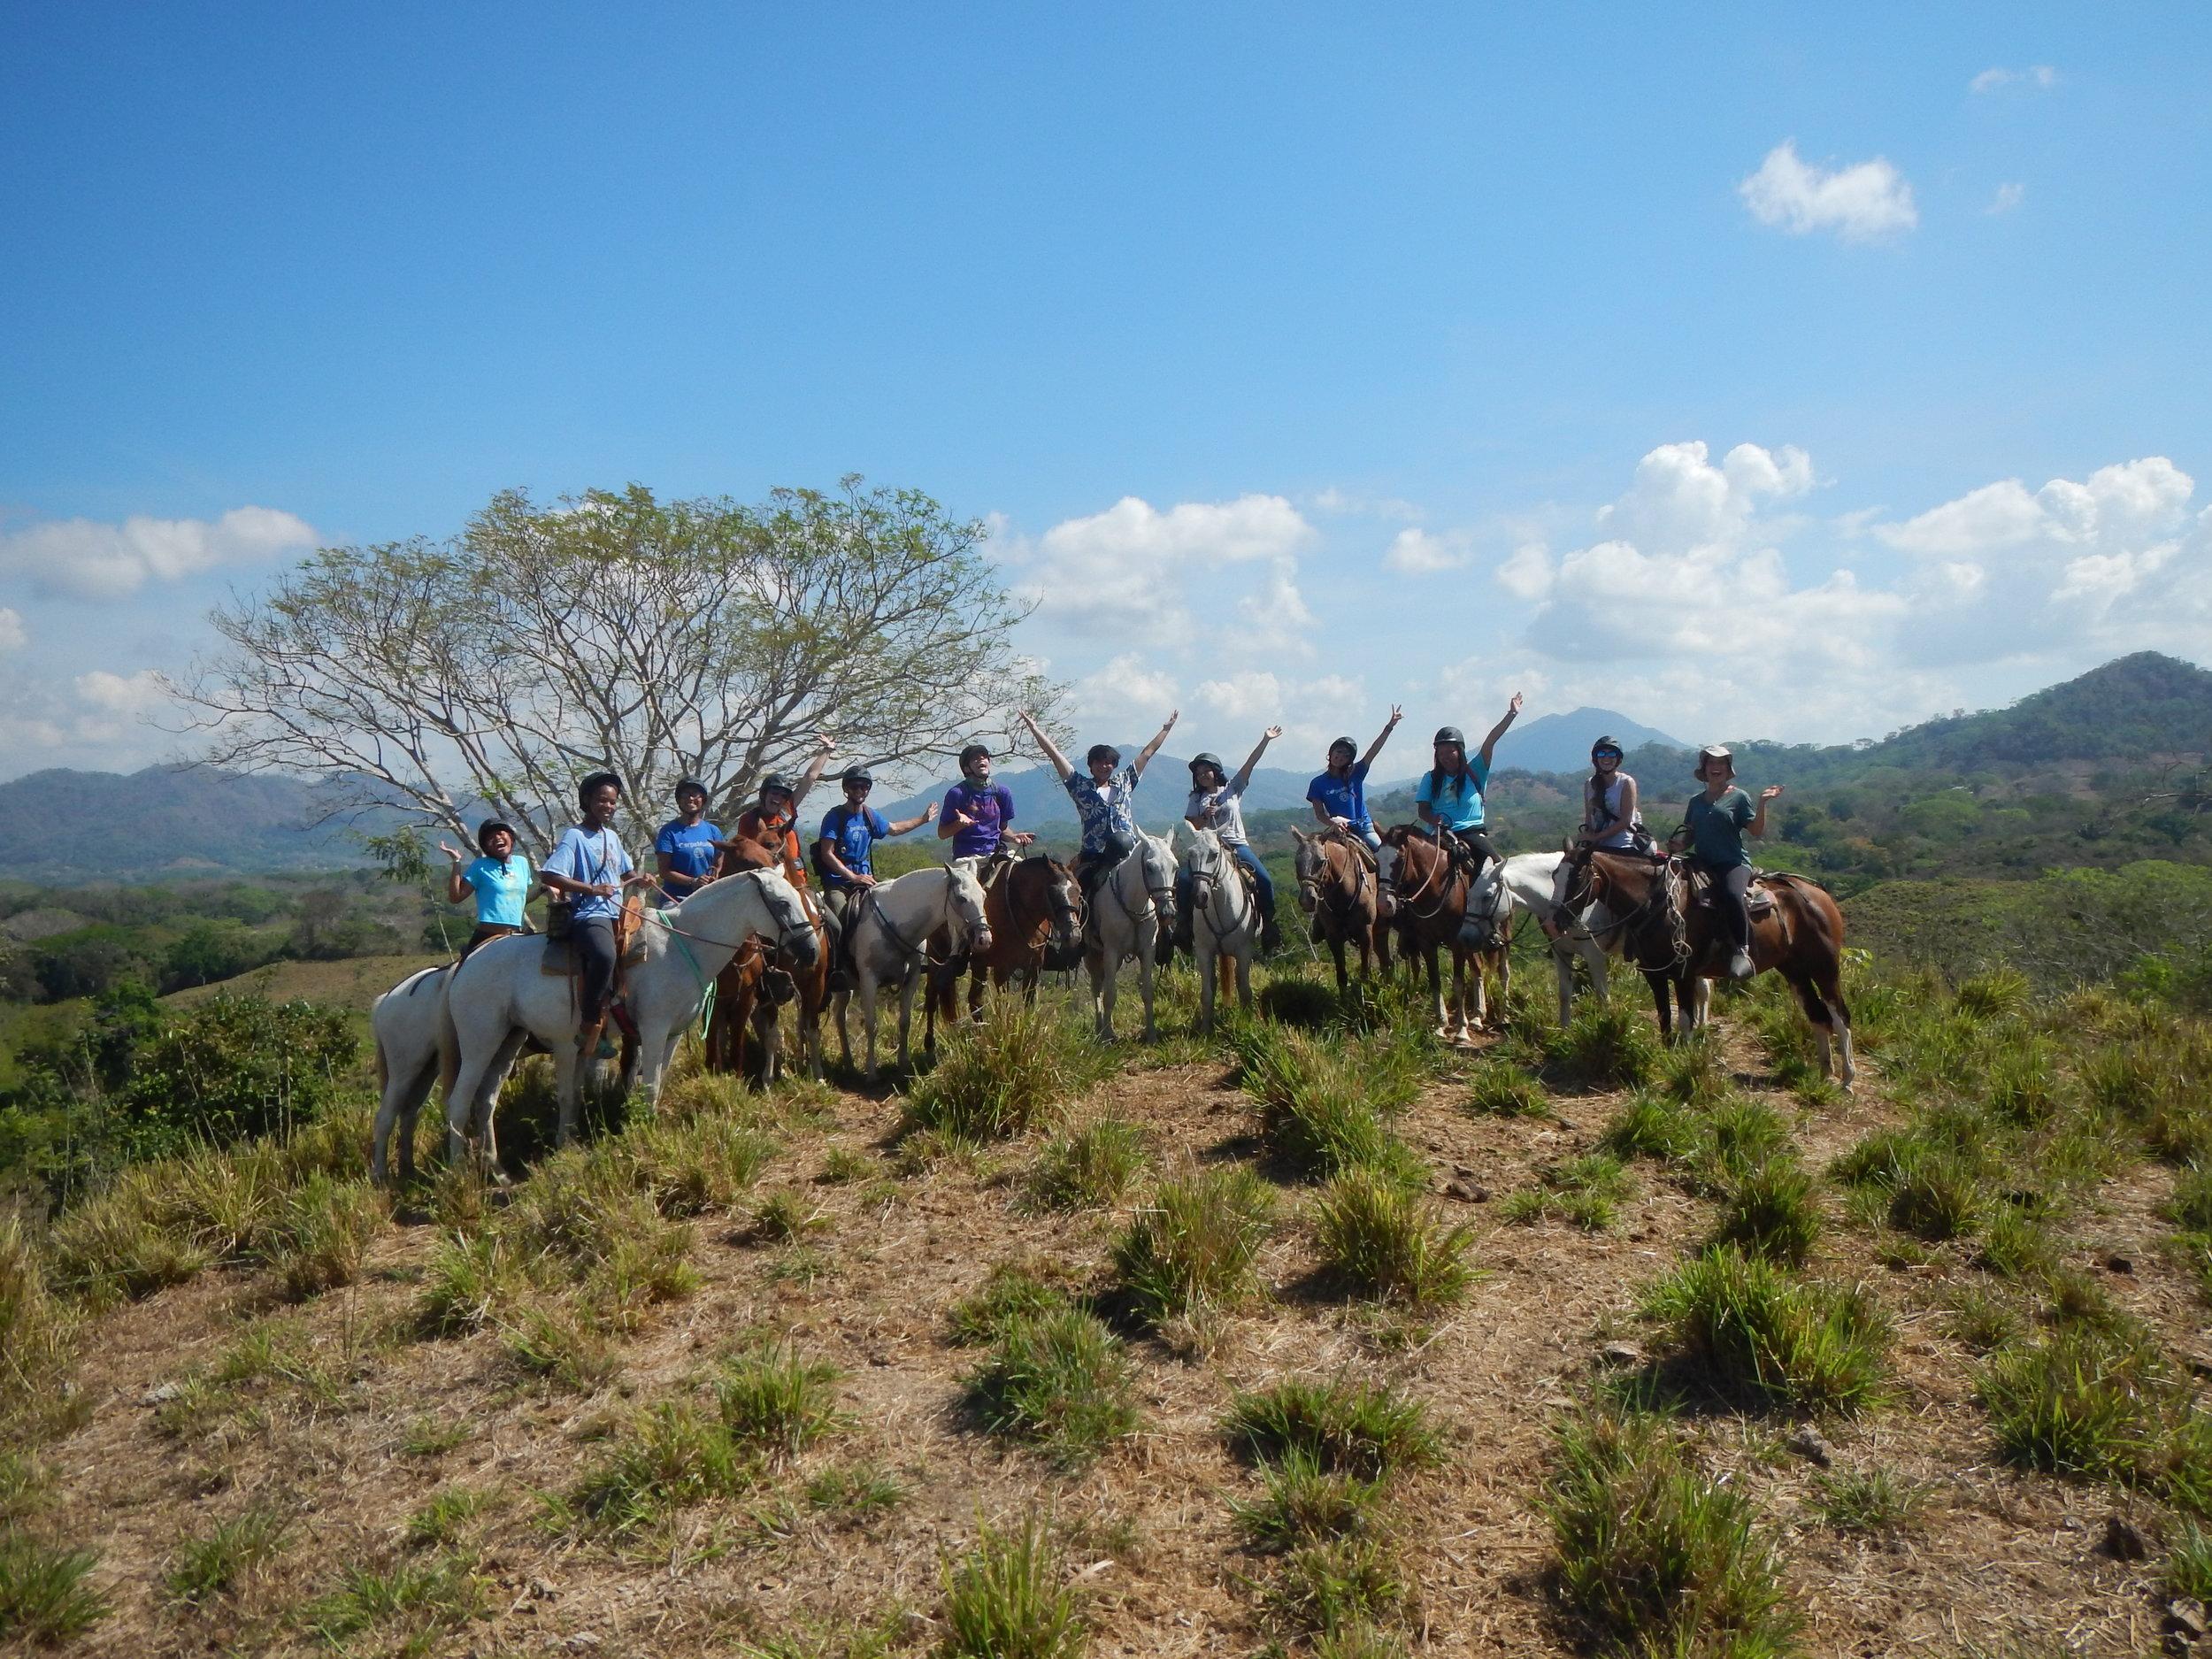 Fortaleza horseback riding in Costa Rica